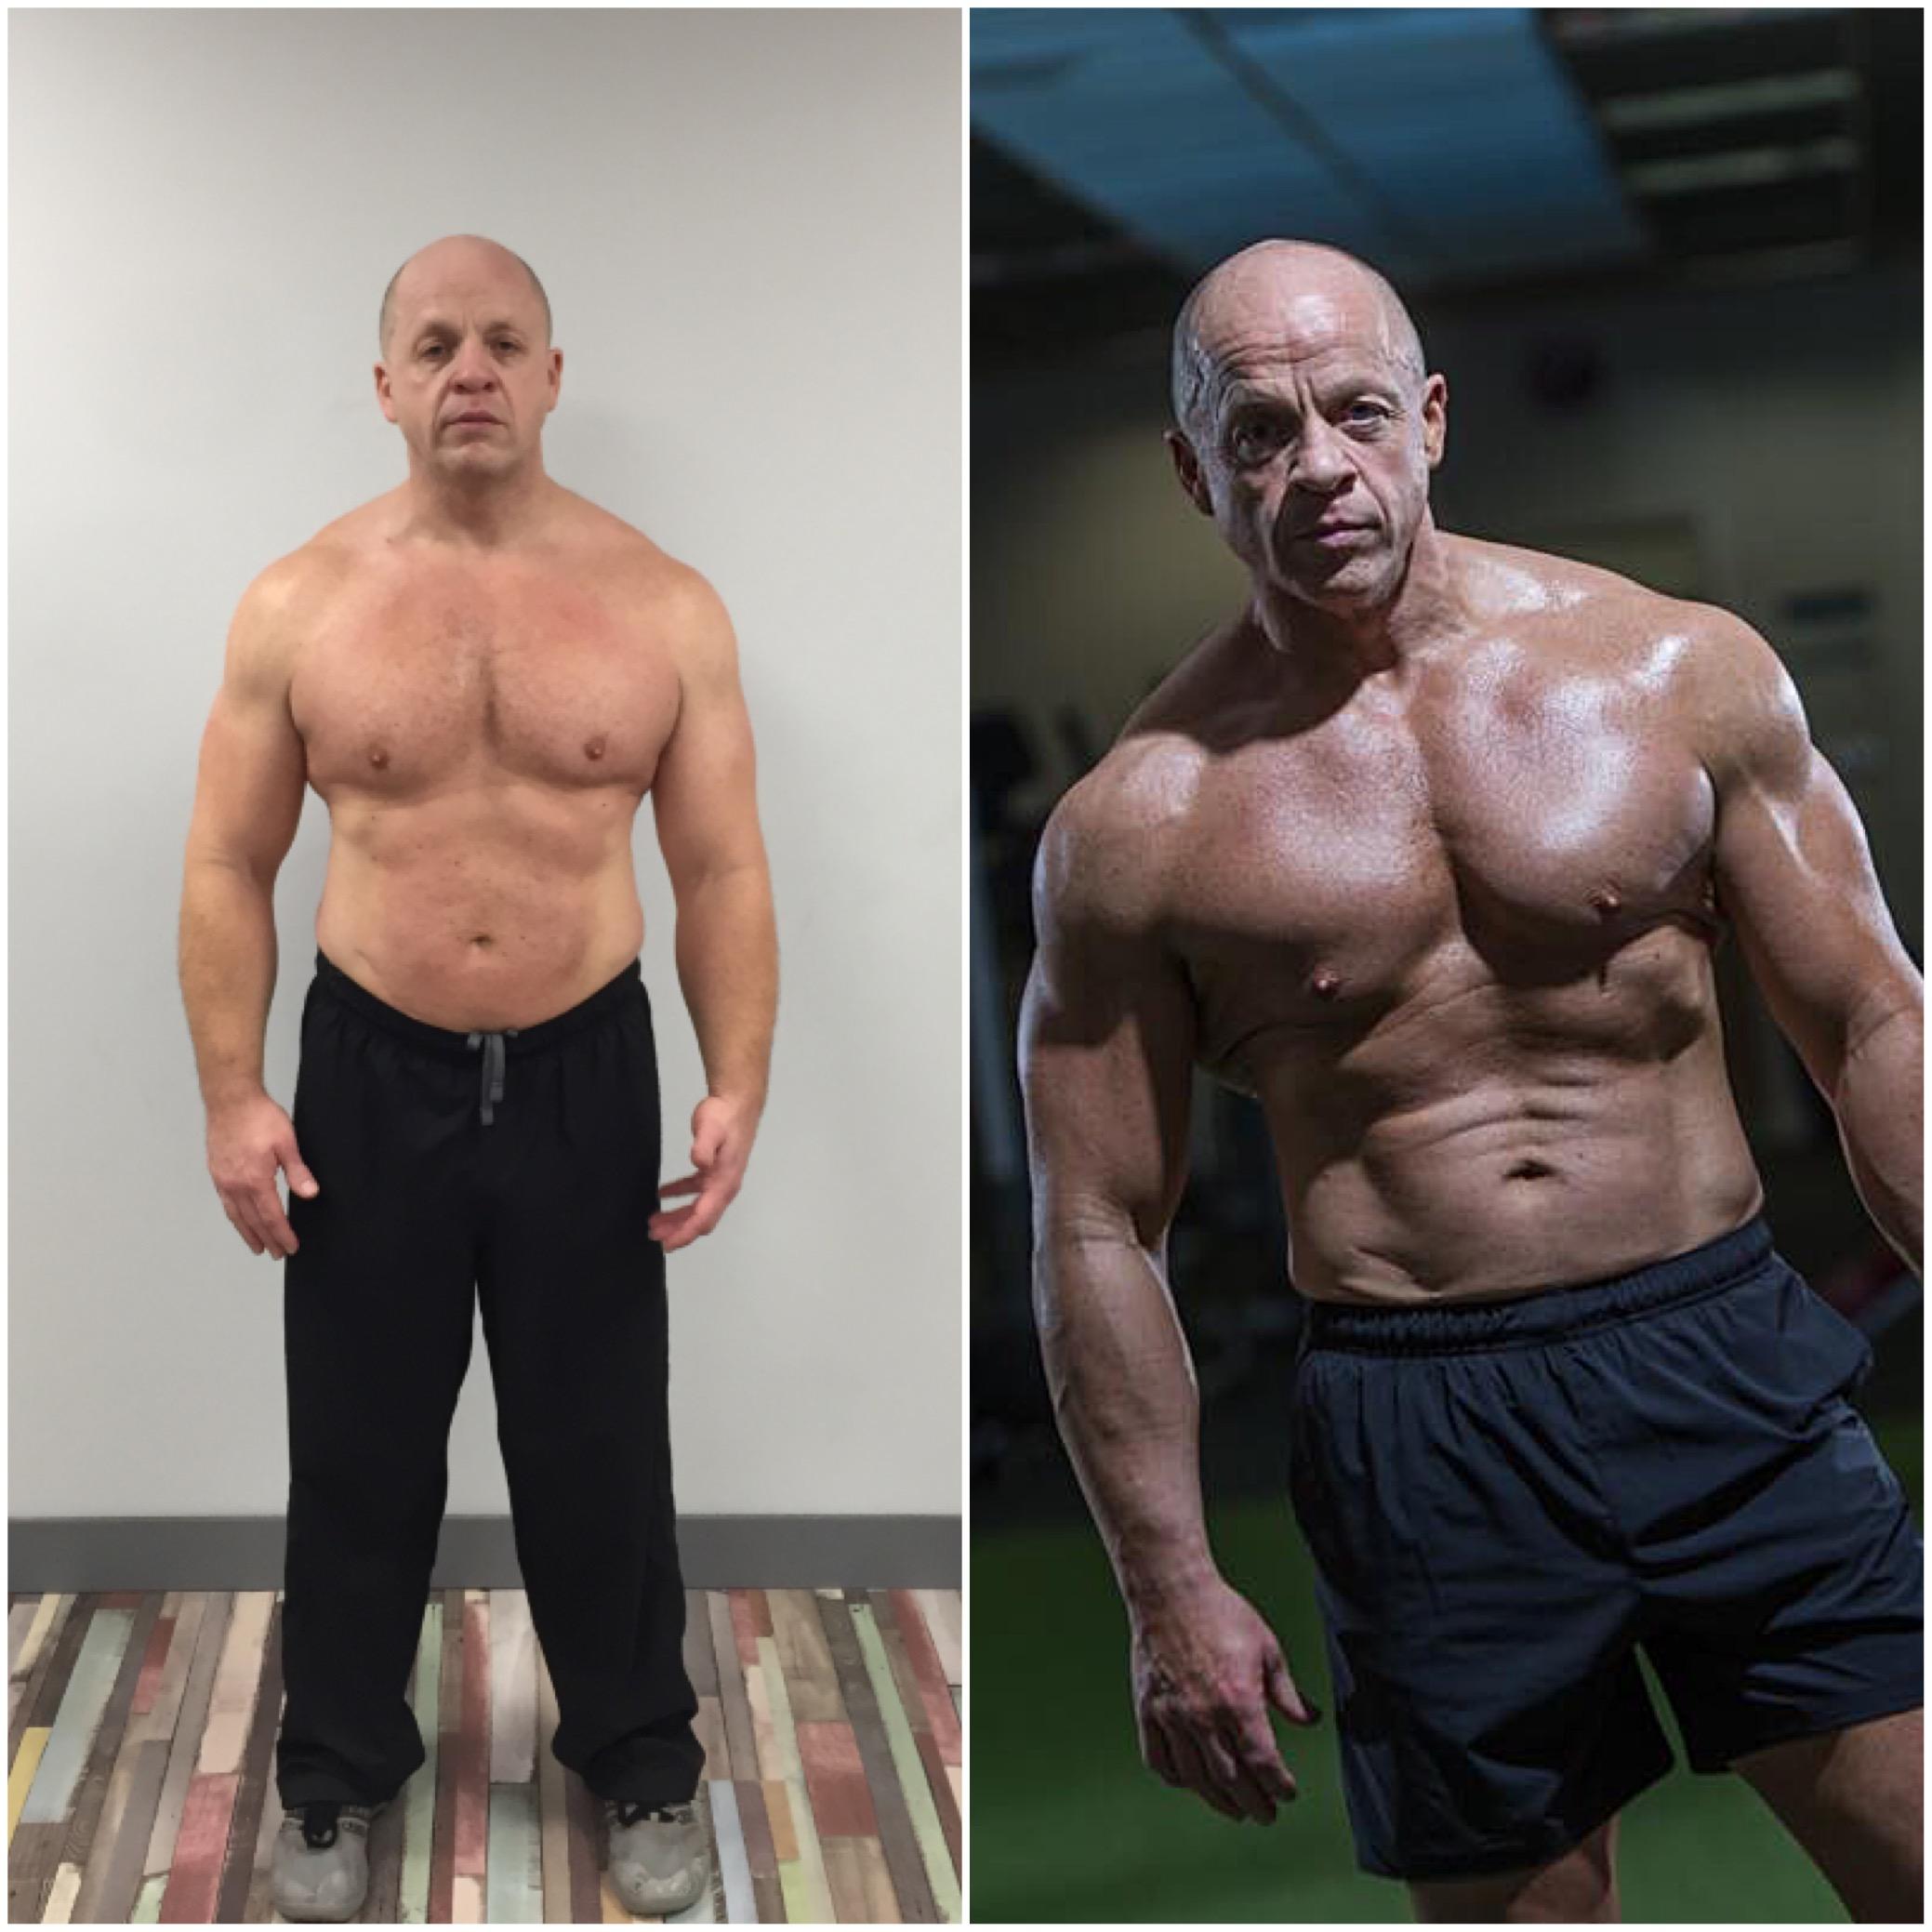 fitness models being sluts